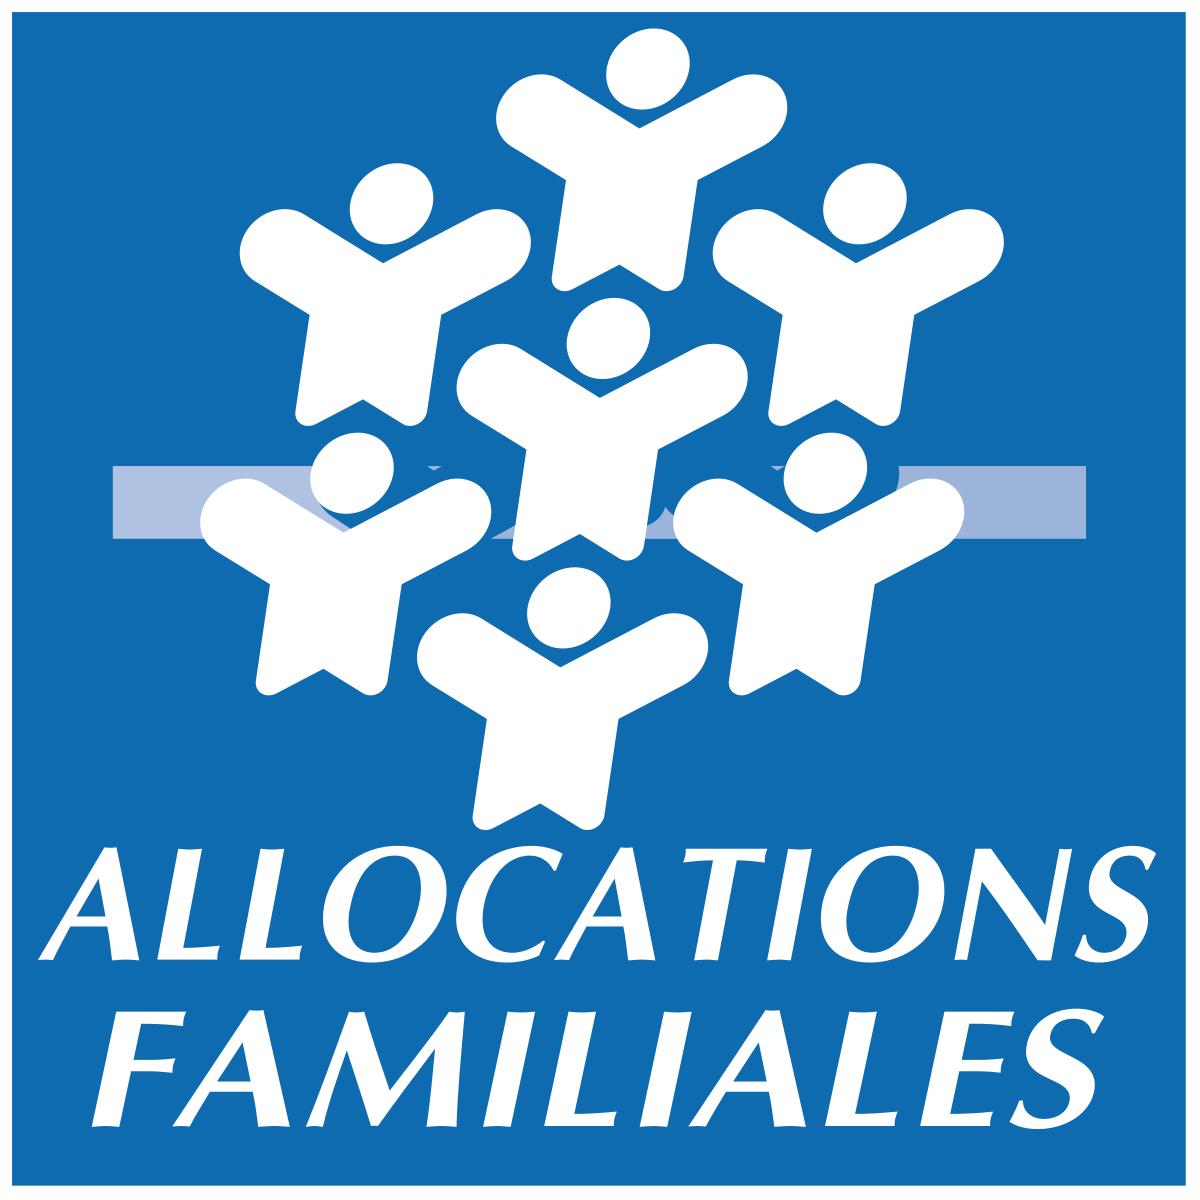 allocations-familiales-logo